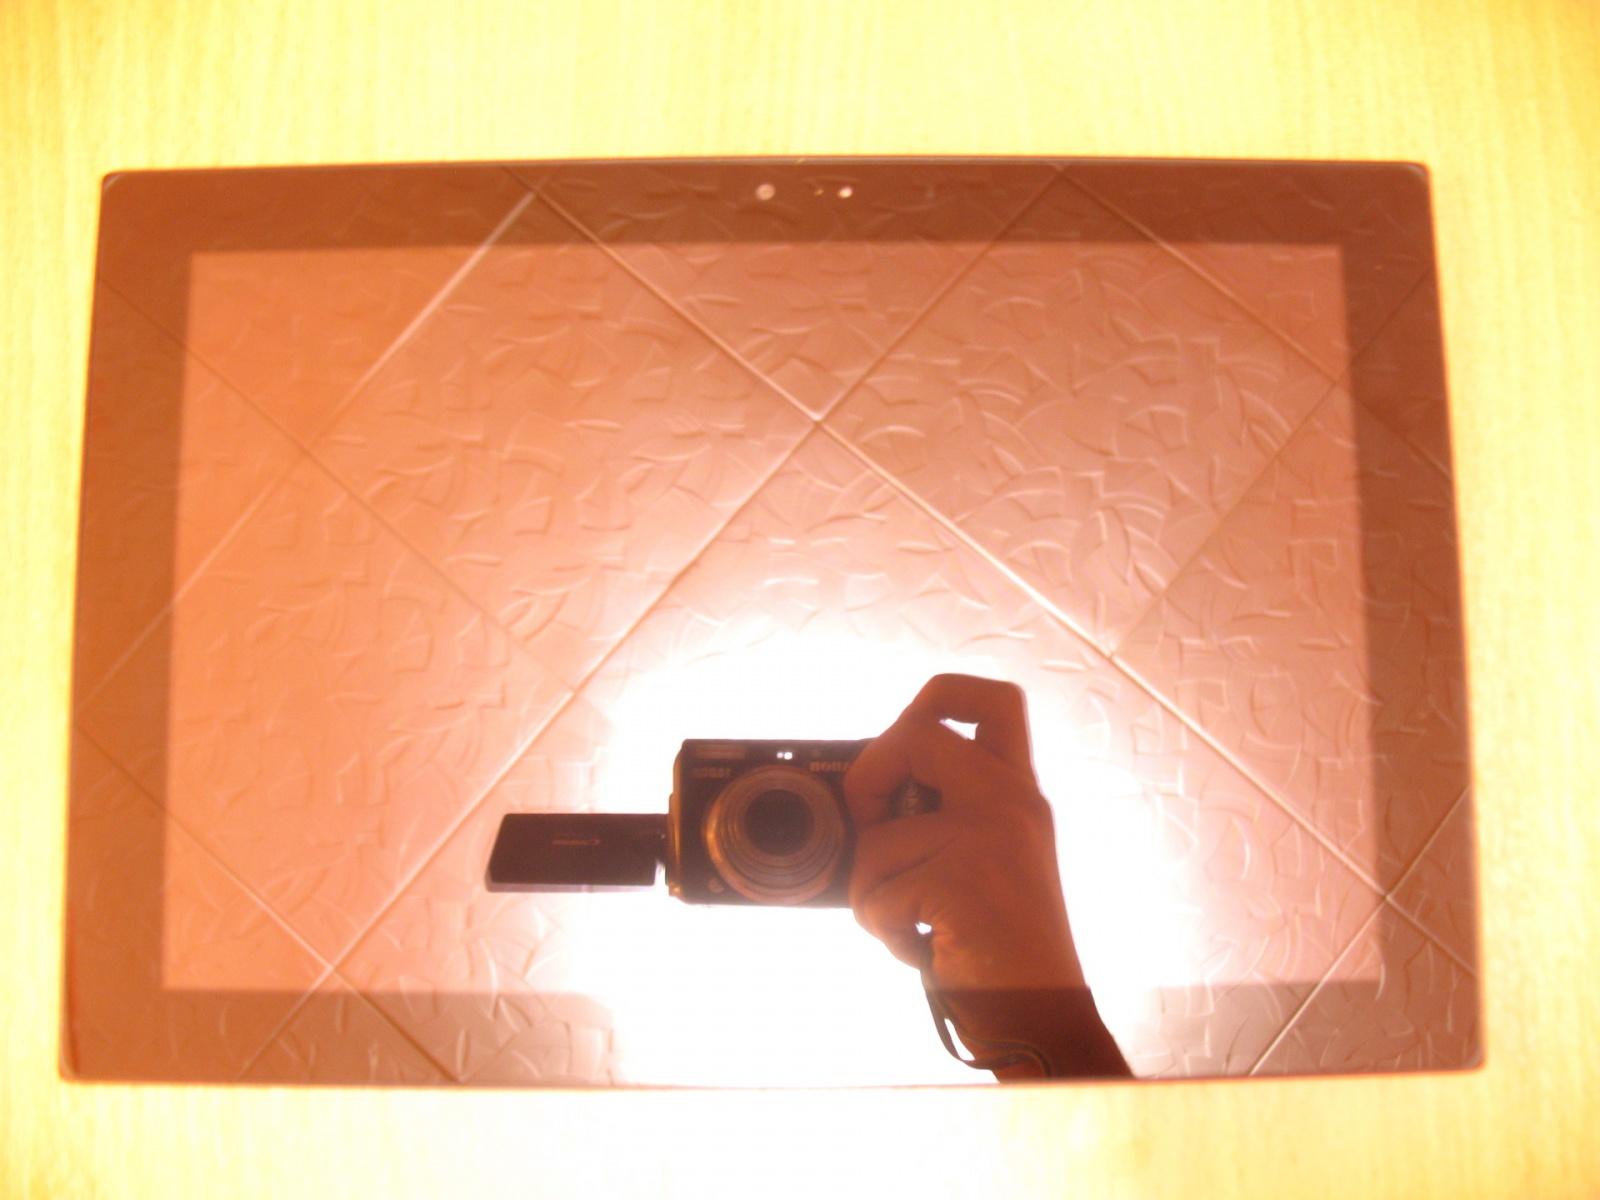 Обзор планшета на Windows 8.1 (Vido w11c) - 9